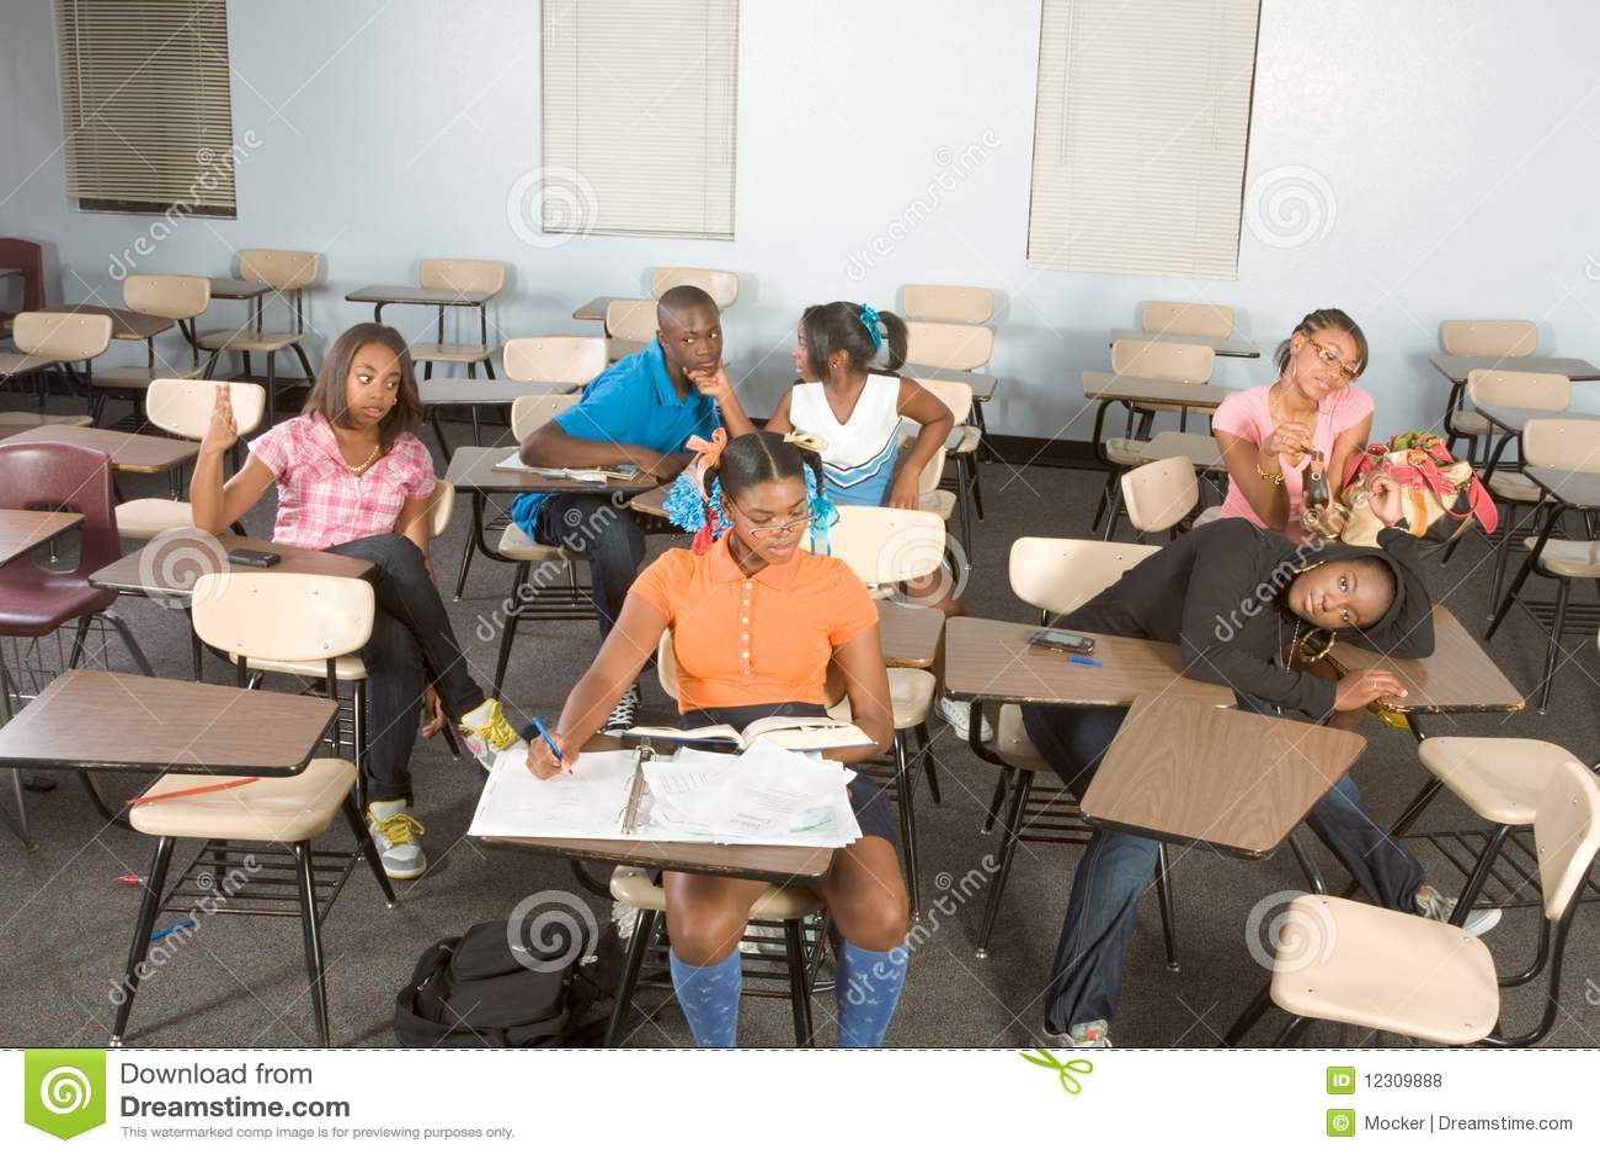 Estudantes de Highschool que sujam na classe durante a ruptura